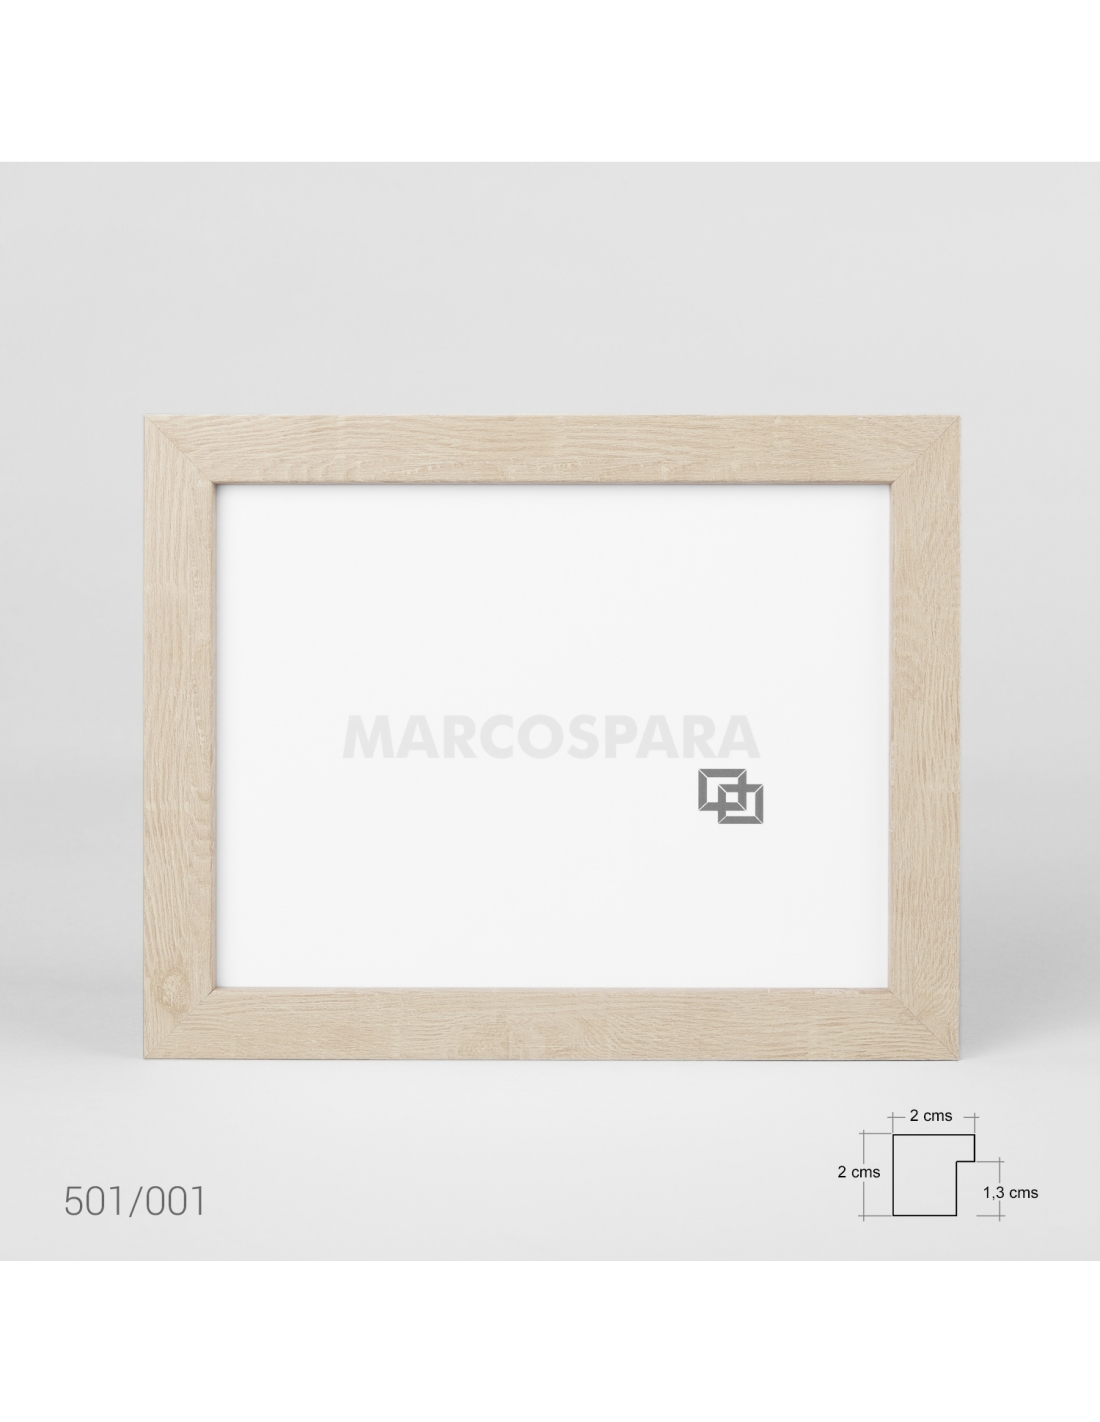 Marcos de madera para Puzzles M501